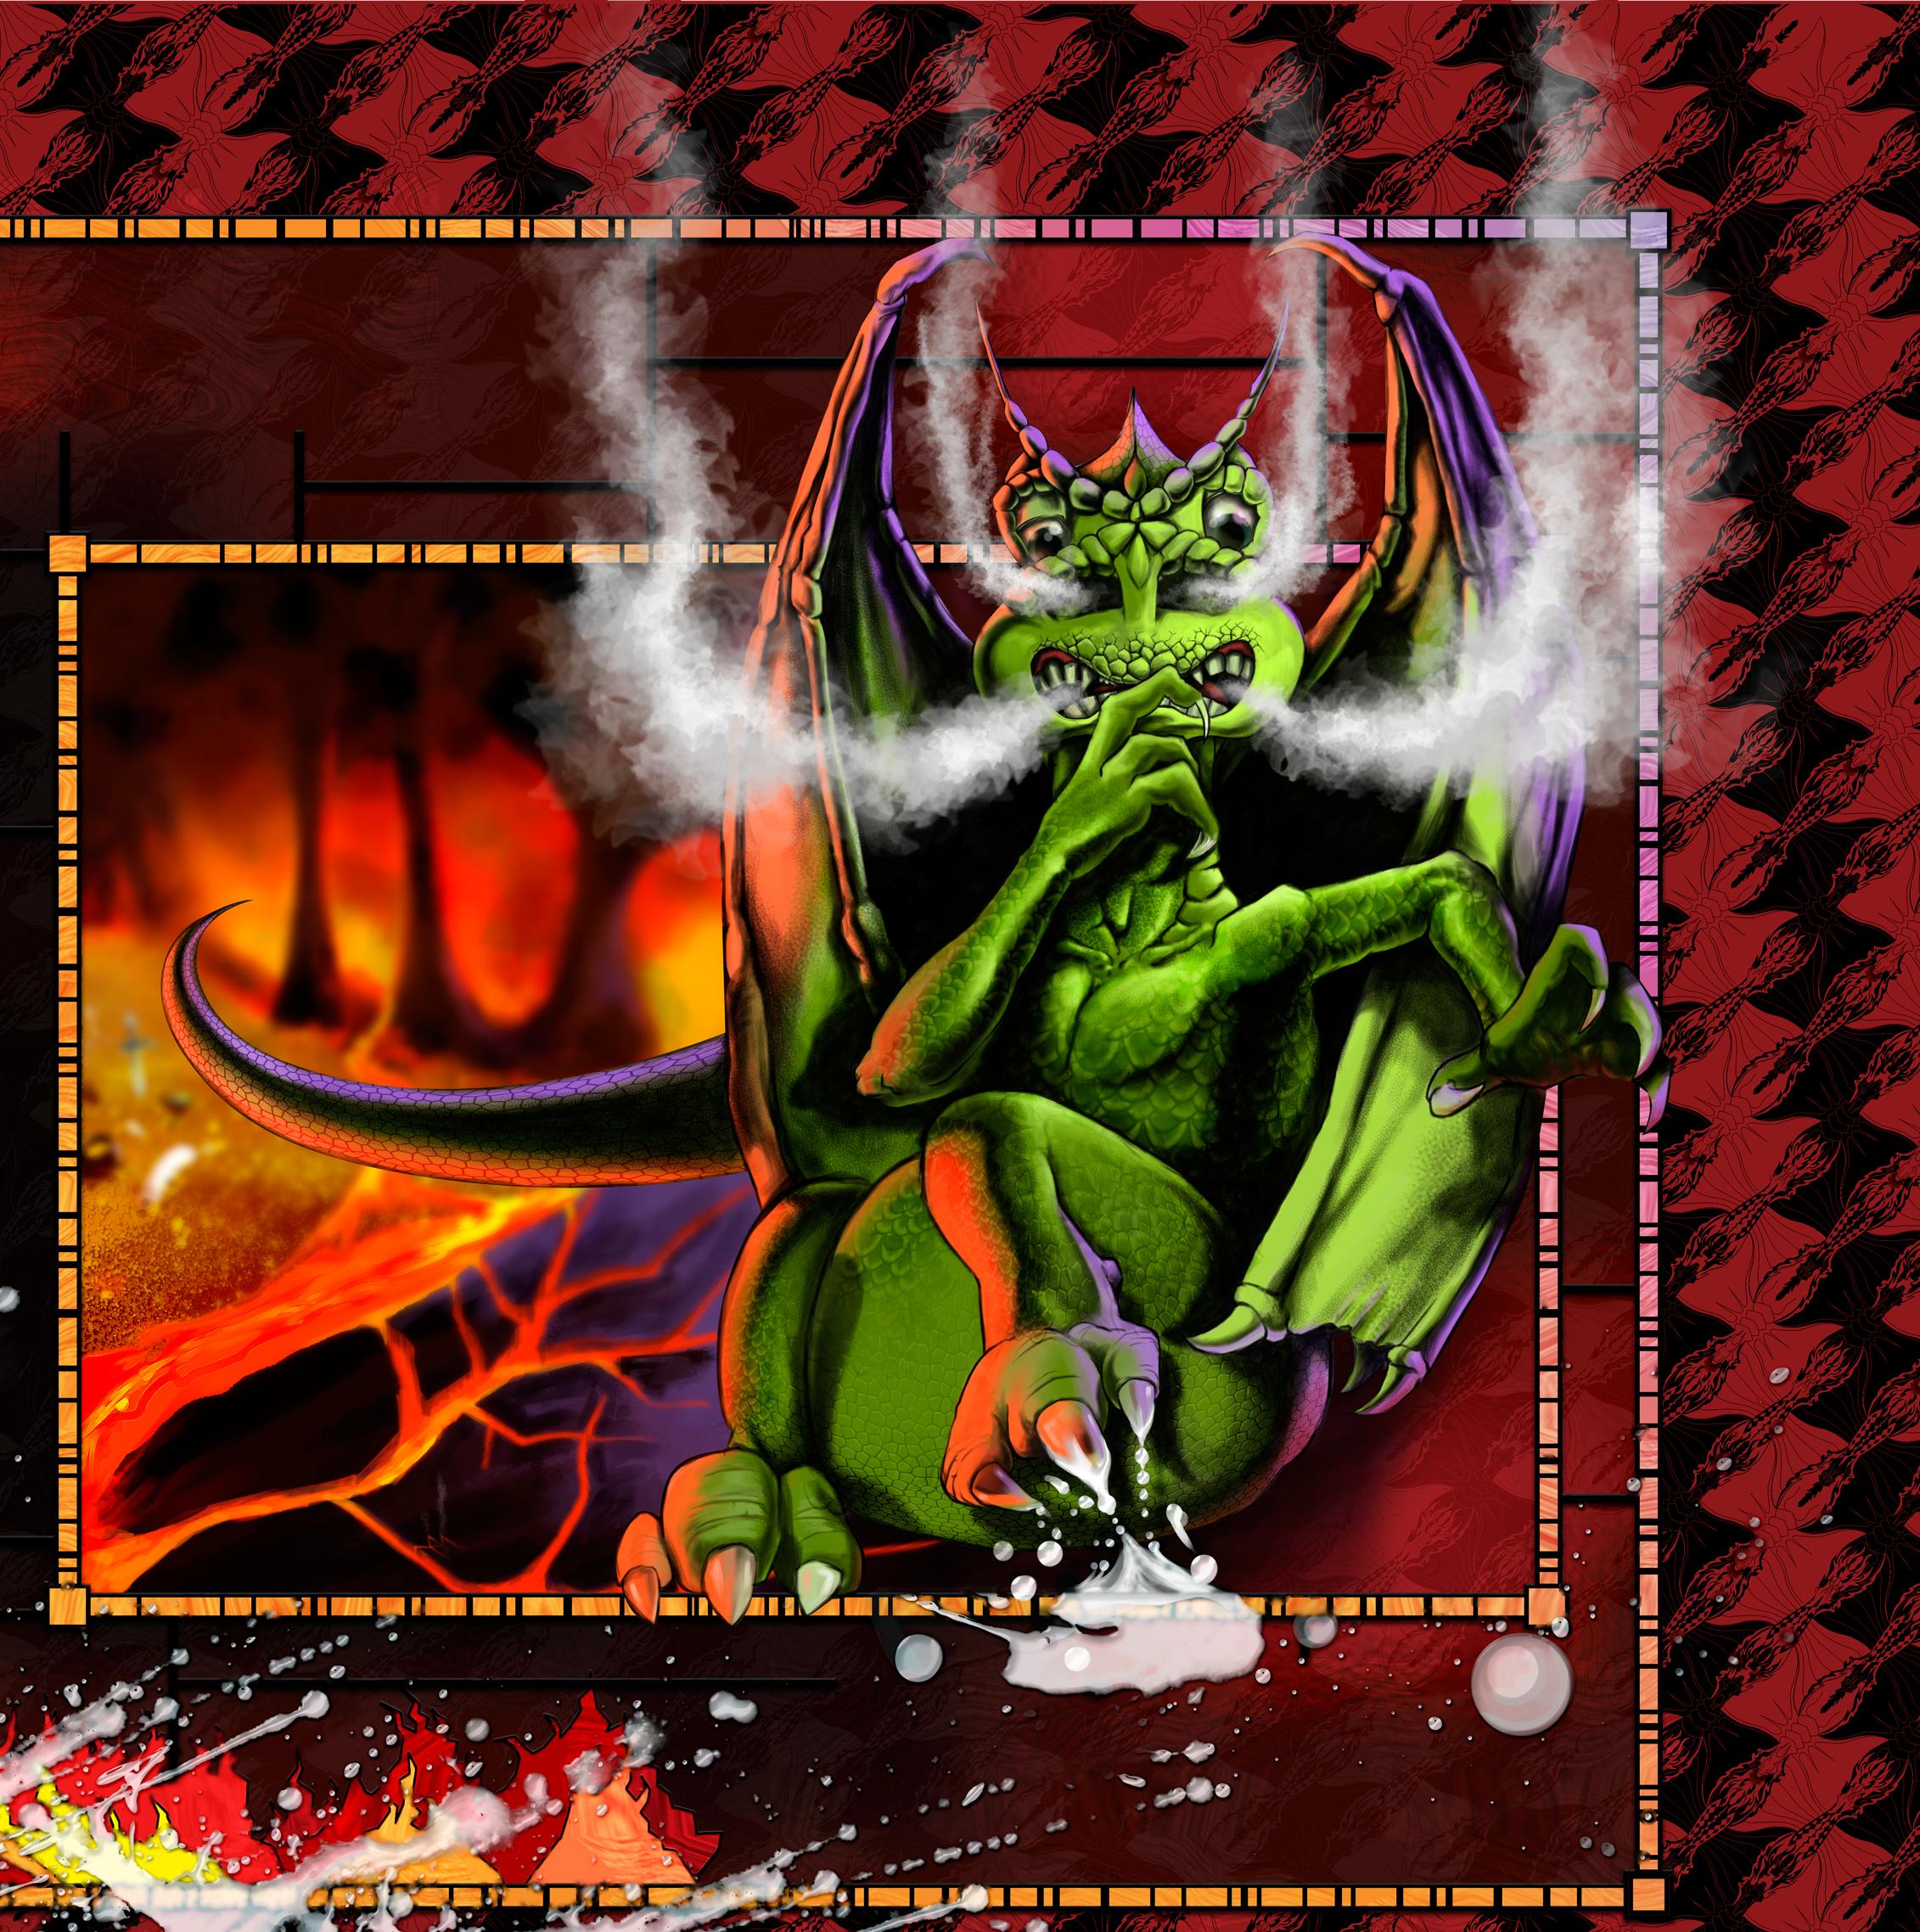 Cc7_8_Dragon_crop.png